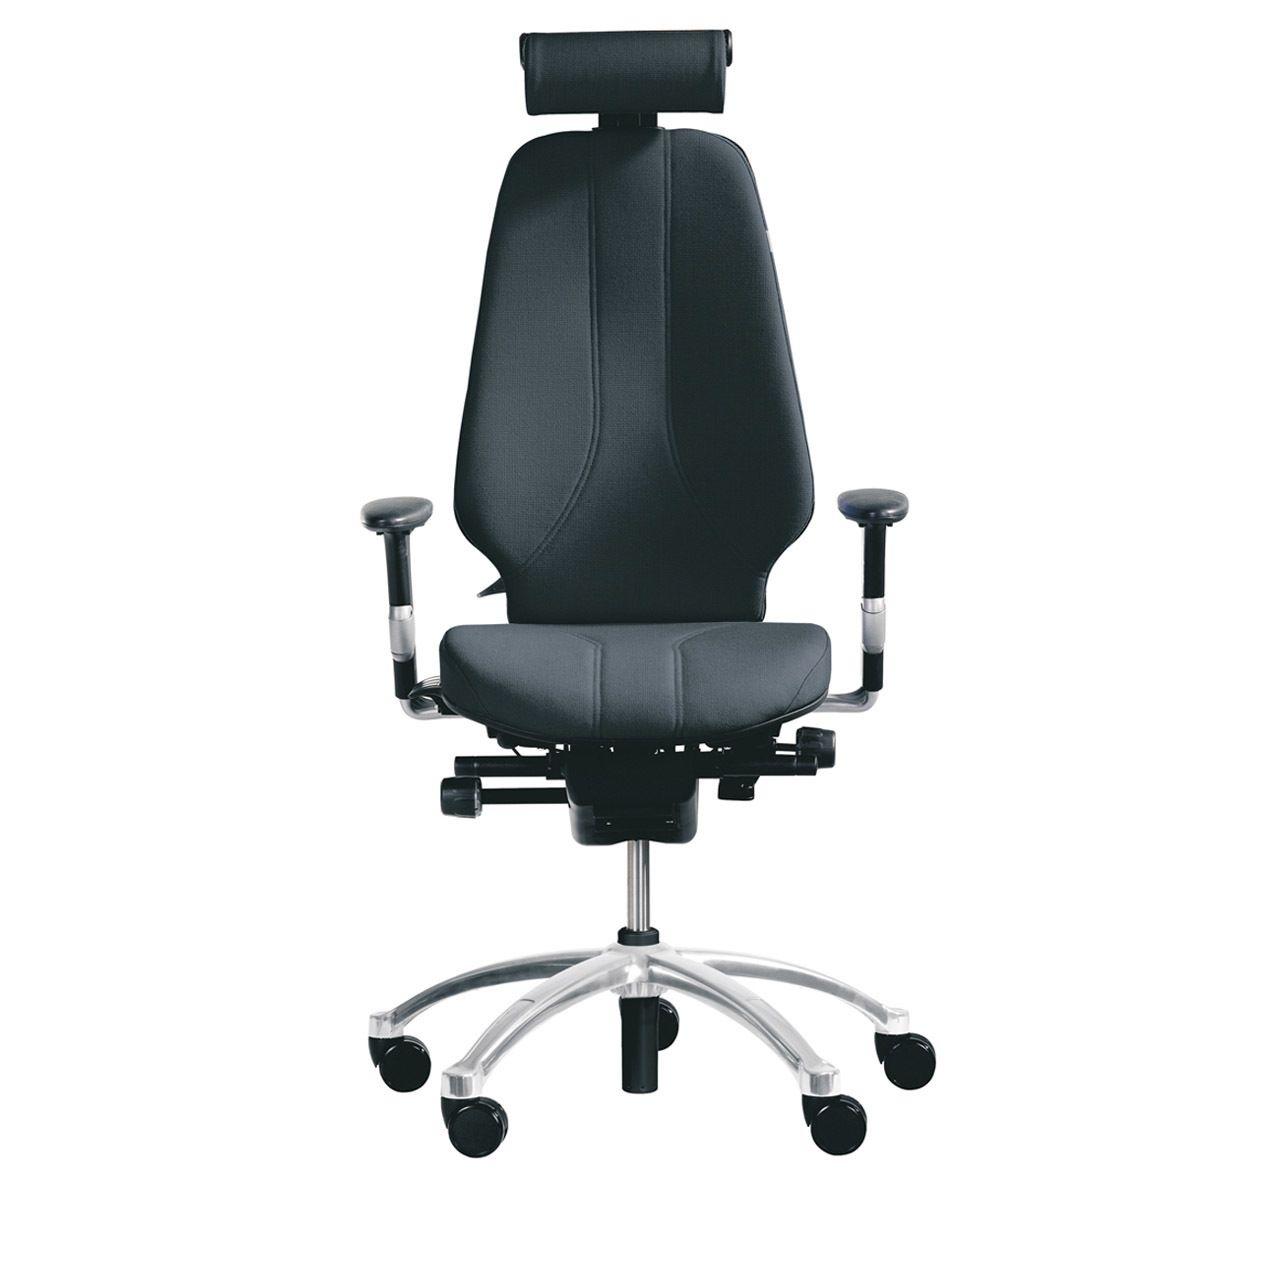 RH Logic 400 XL Ergonomische bureaustoel neksteun